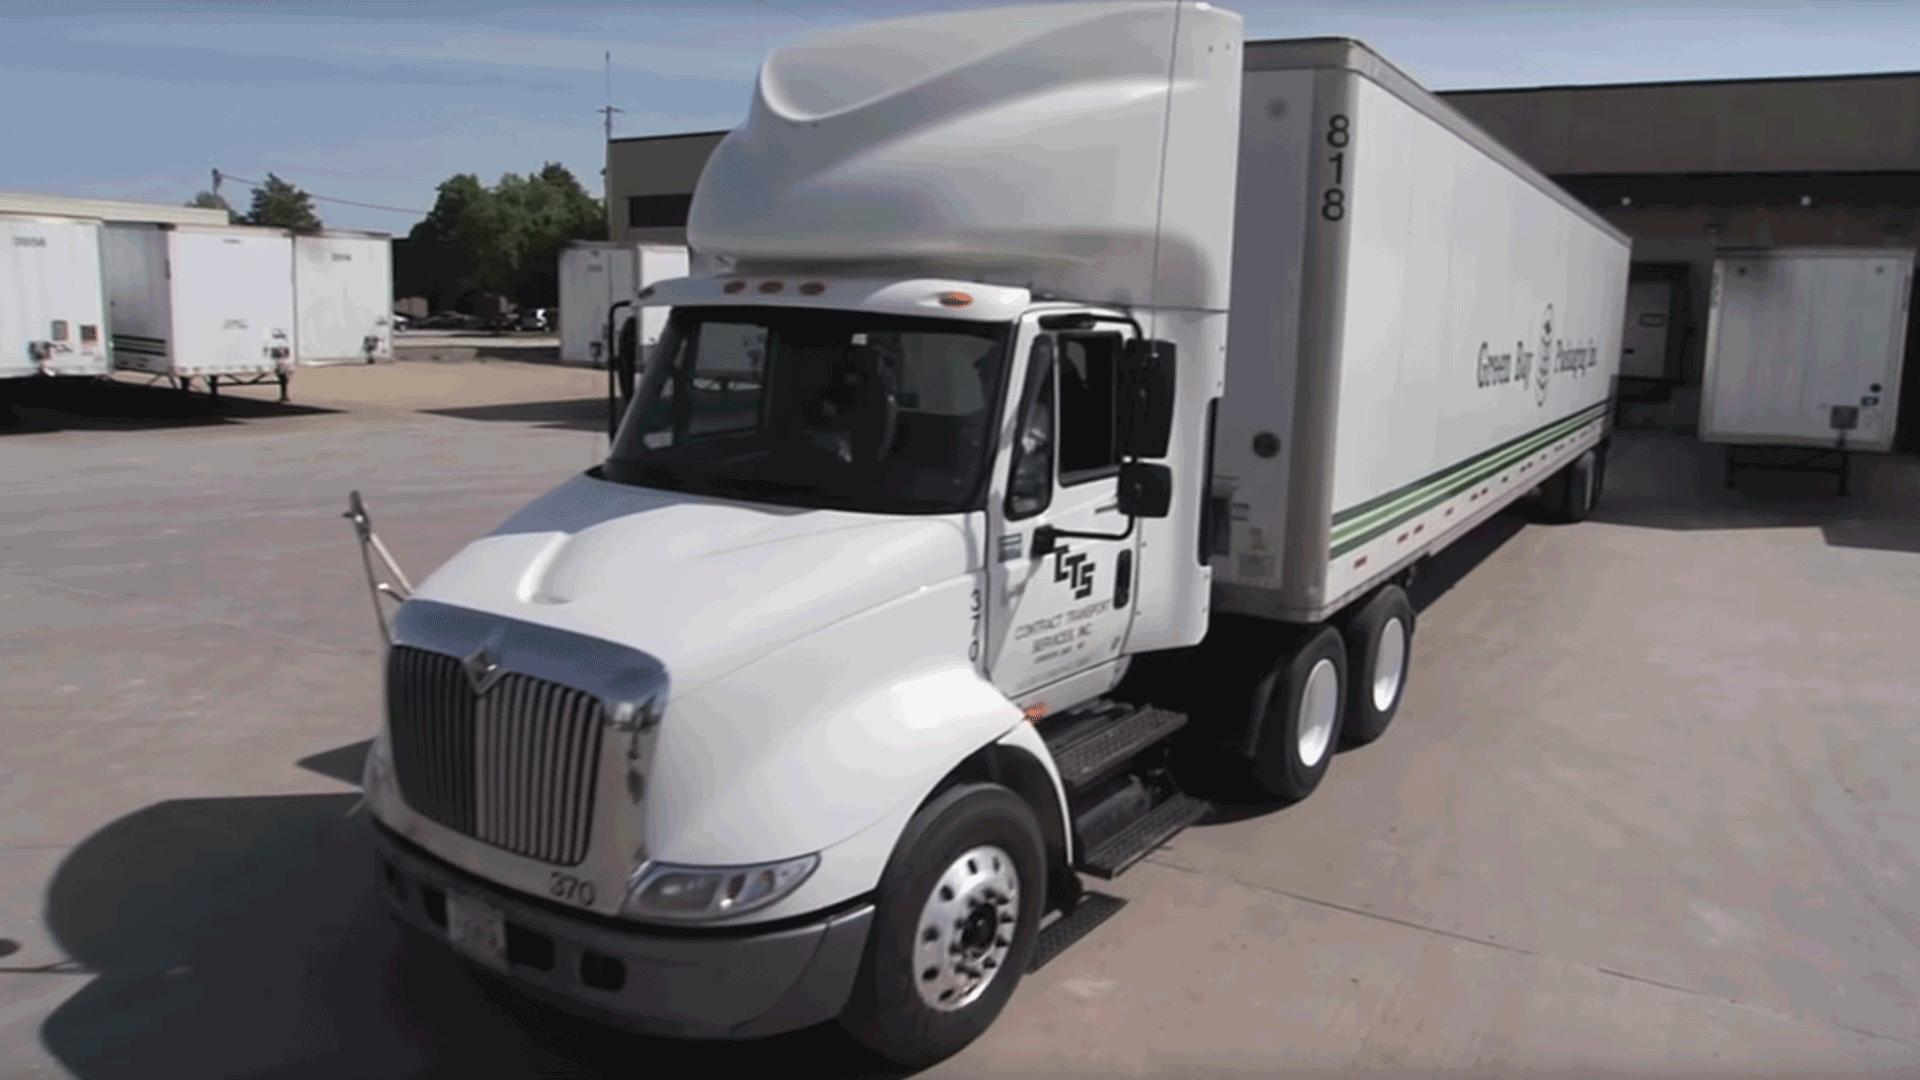 Green Bay Packaging, Semi Truck, Truck